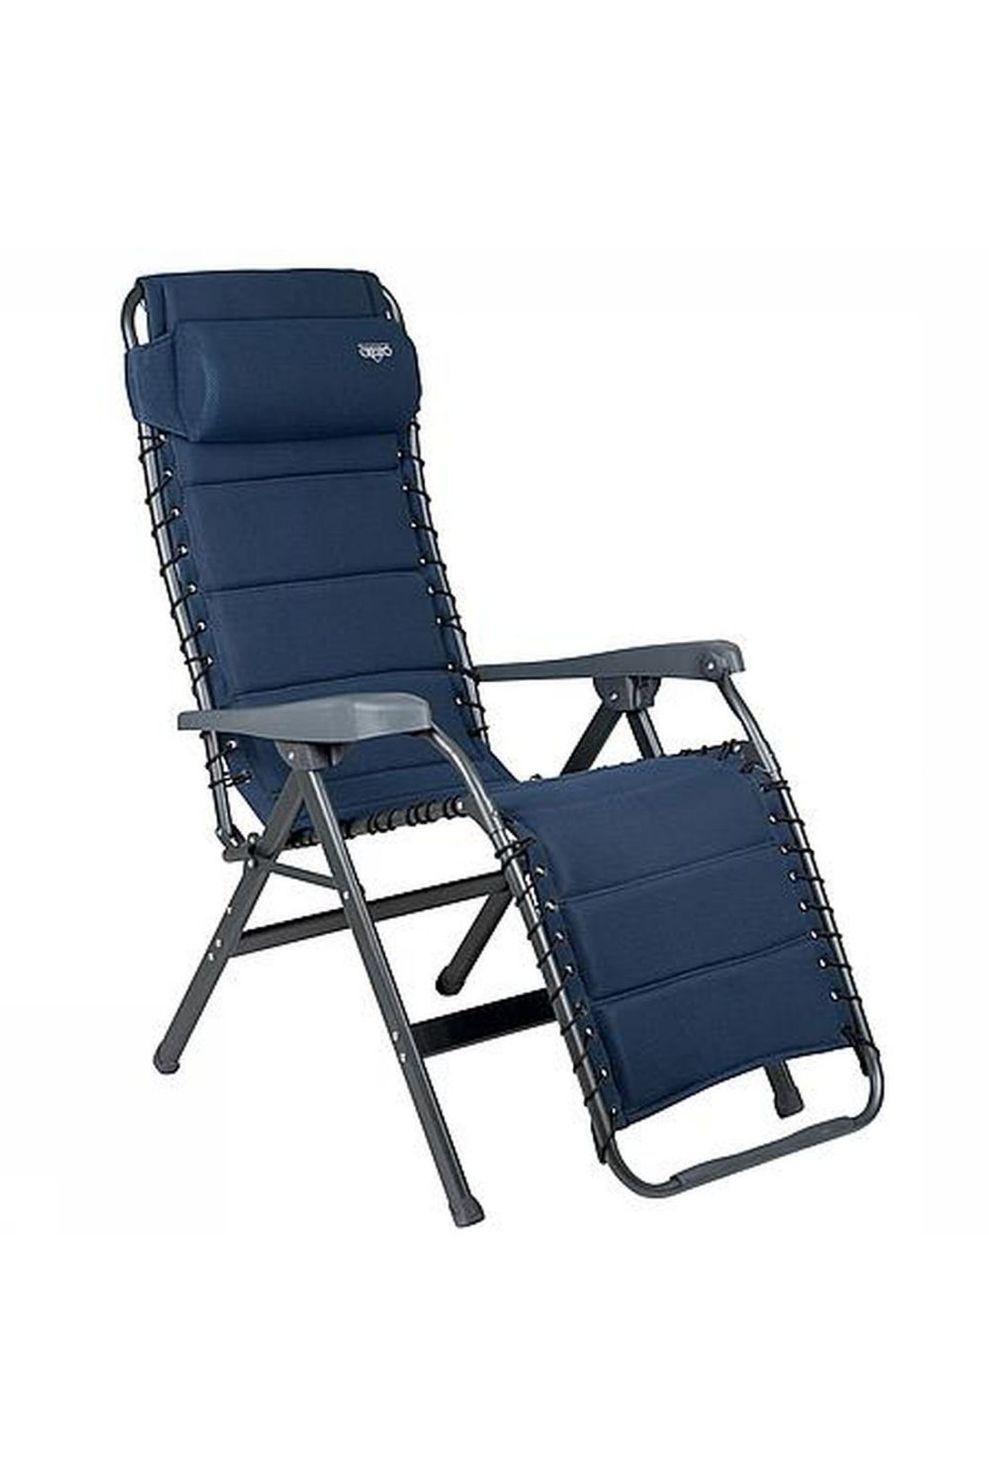 Crespo Relaxstoel Ap-232 Air-Deluxe - Blauw